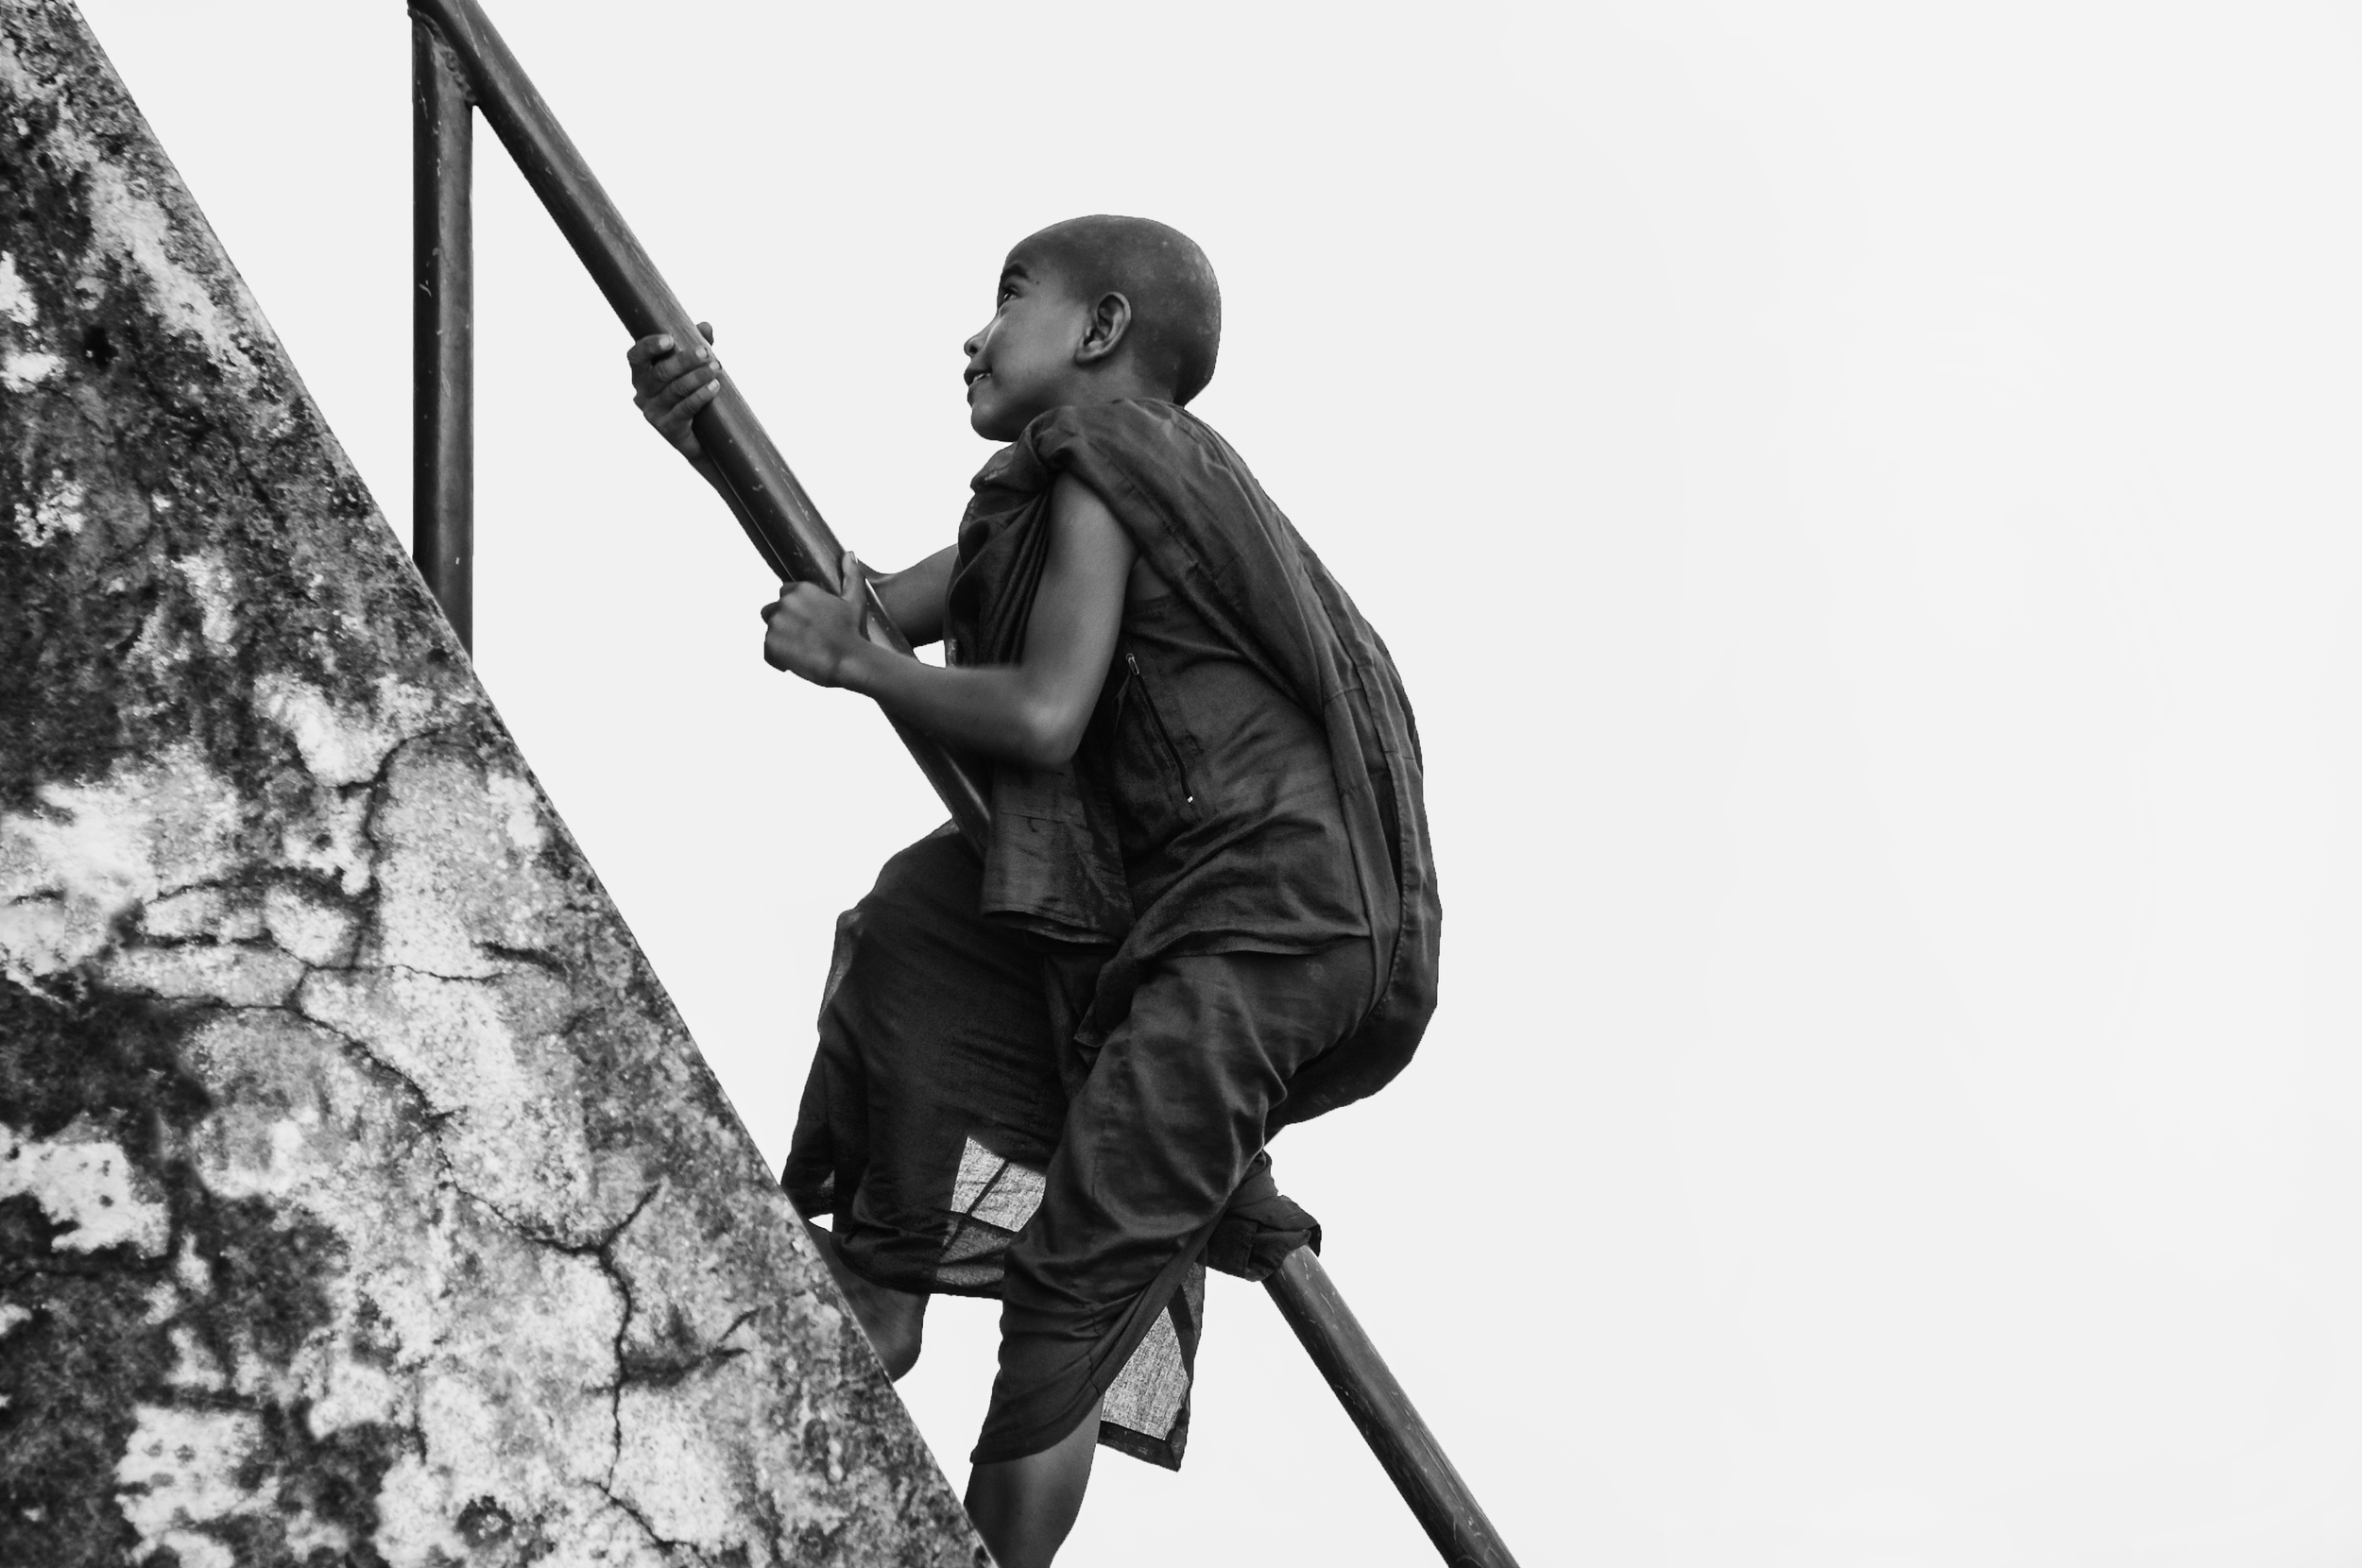 Bagan Climber.jpg